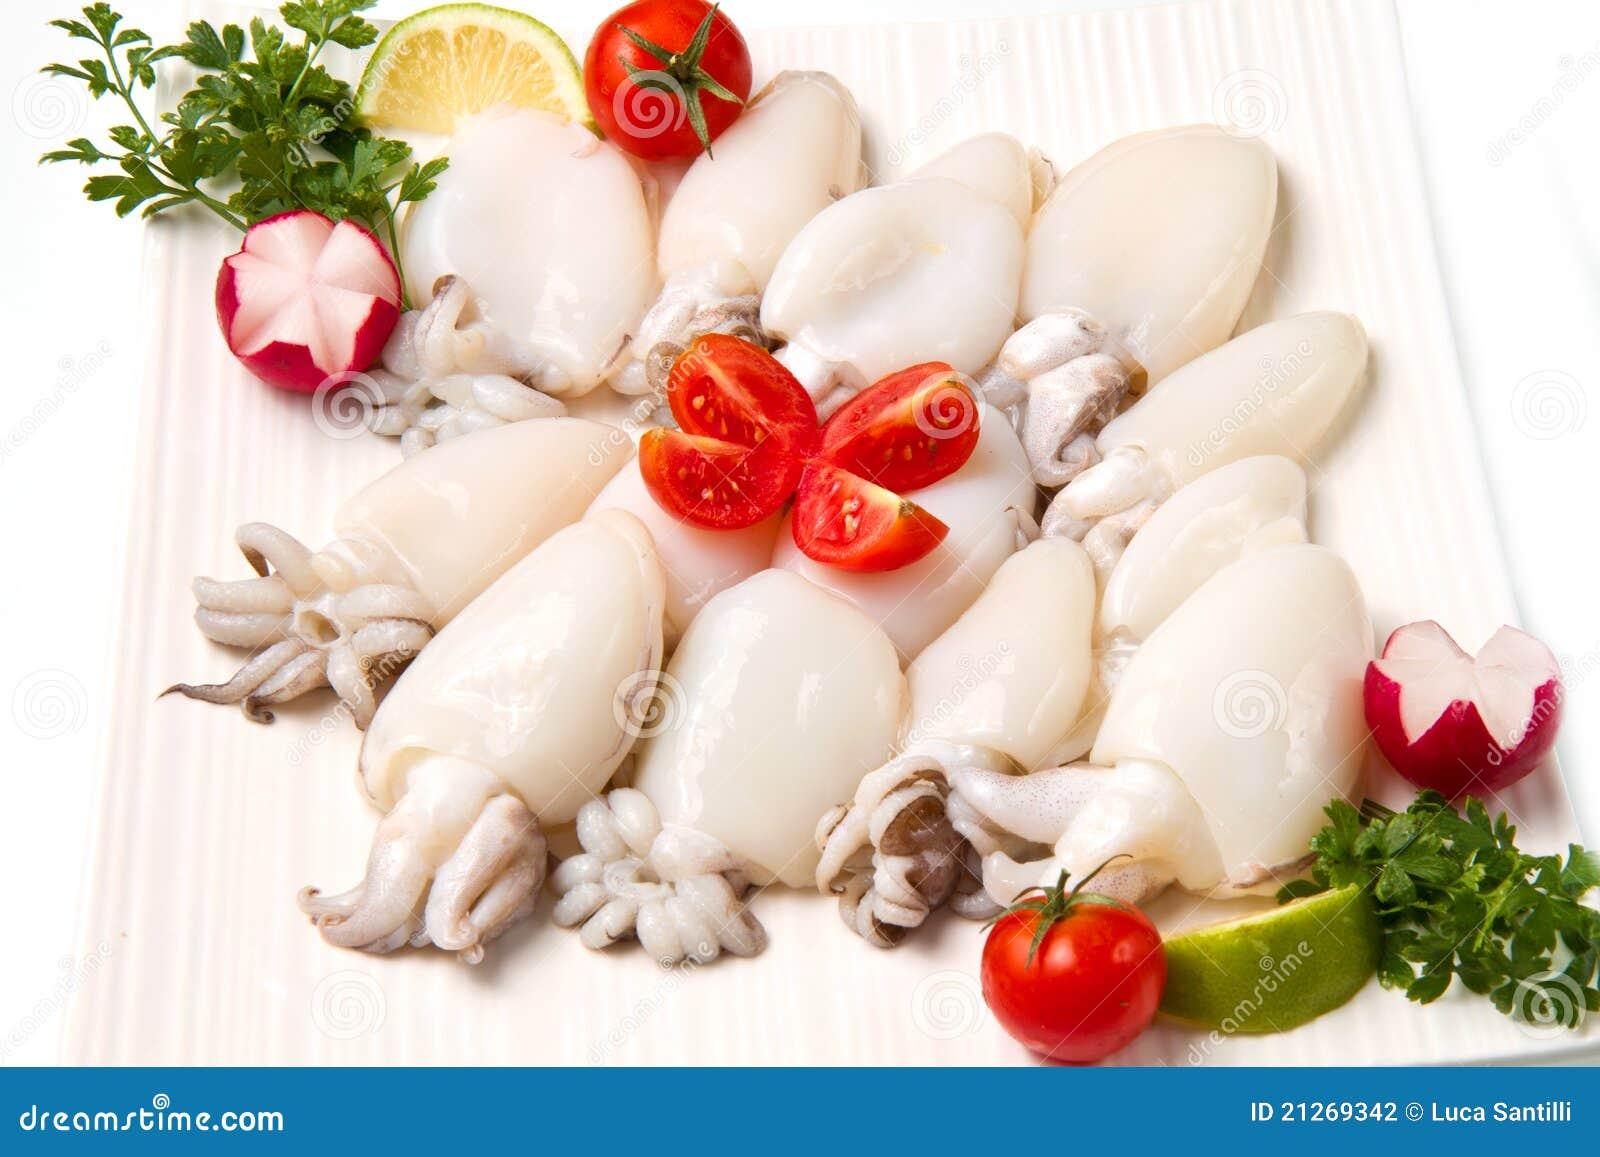 Fresh cuttlefish with peas